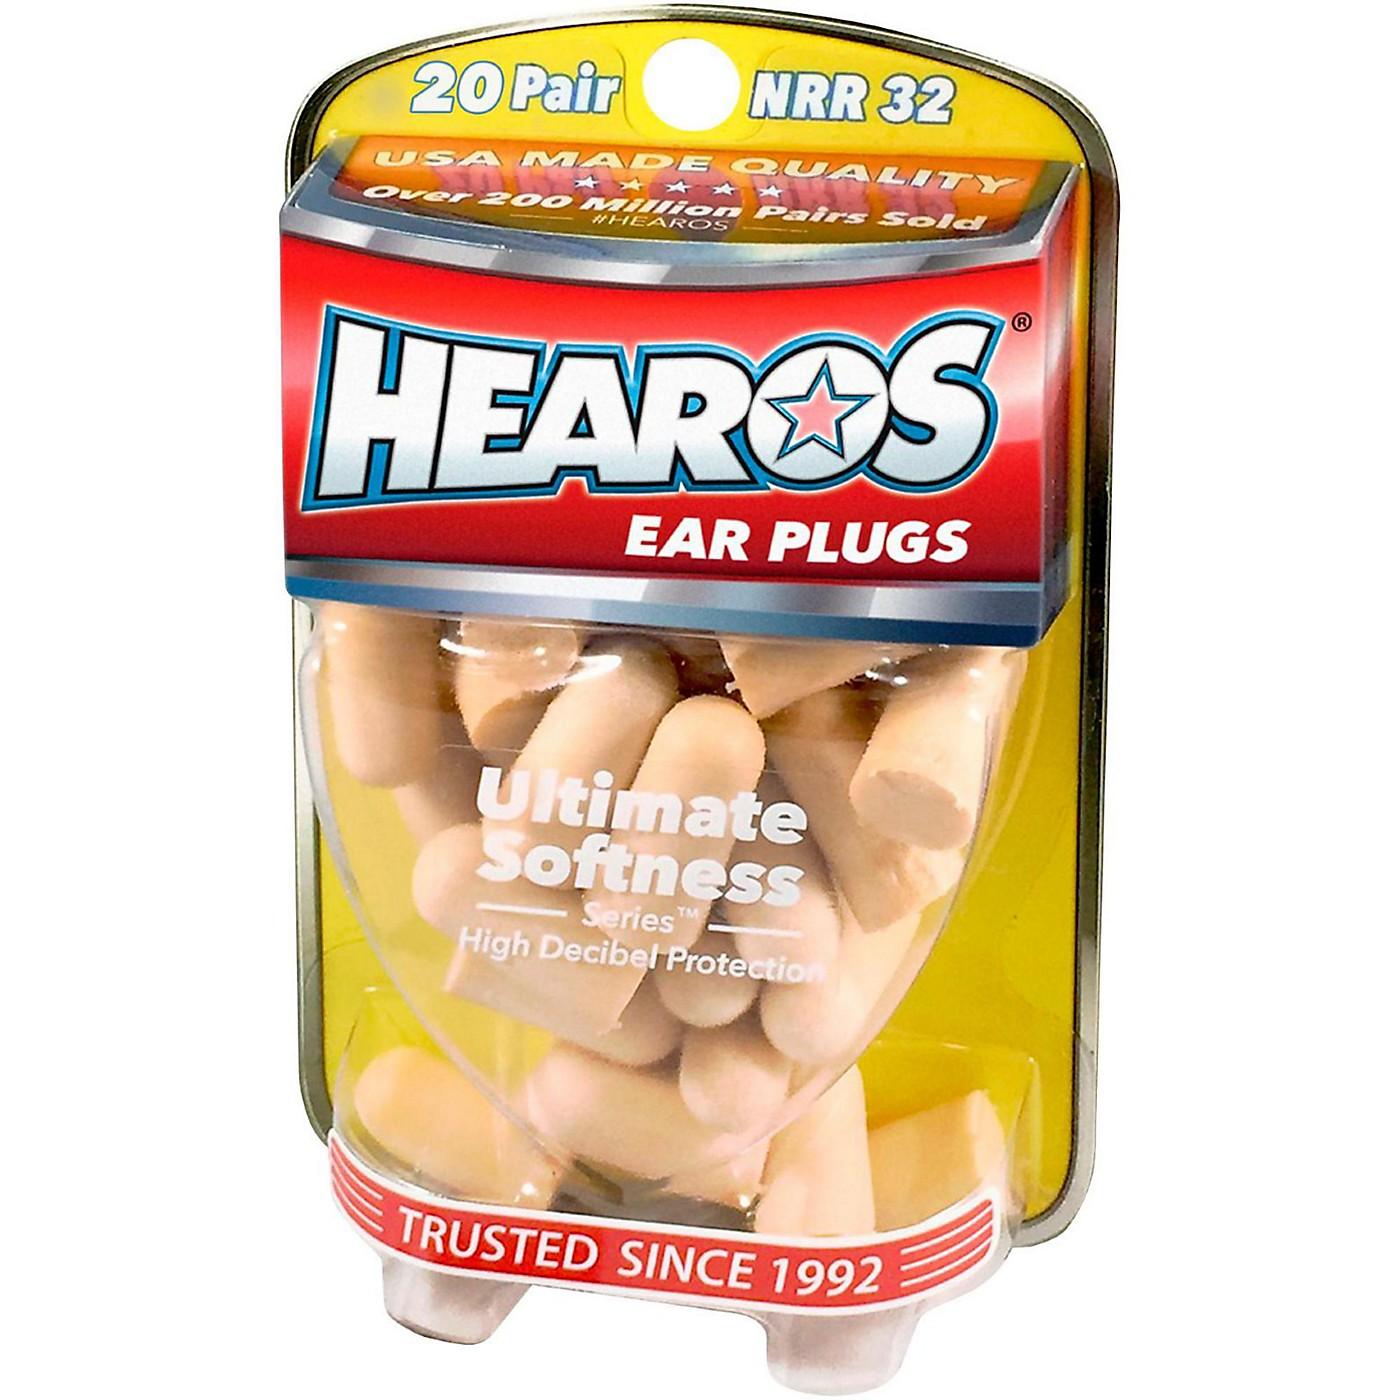 Hearos Ultimate Softness Bulk Pack Ear Plugs 20-Pairs thumbnail